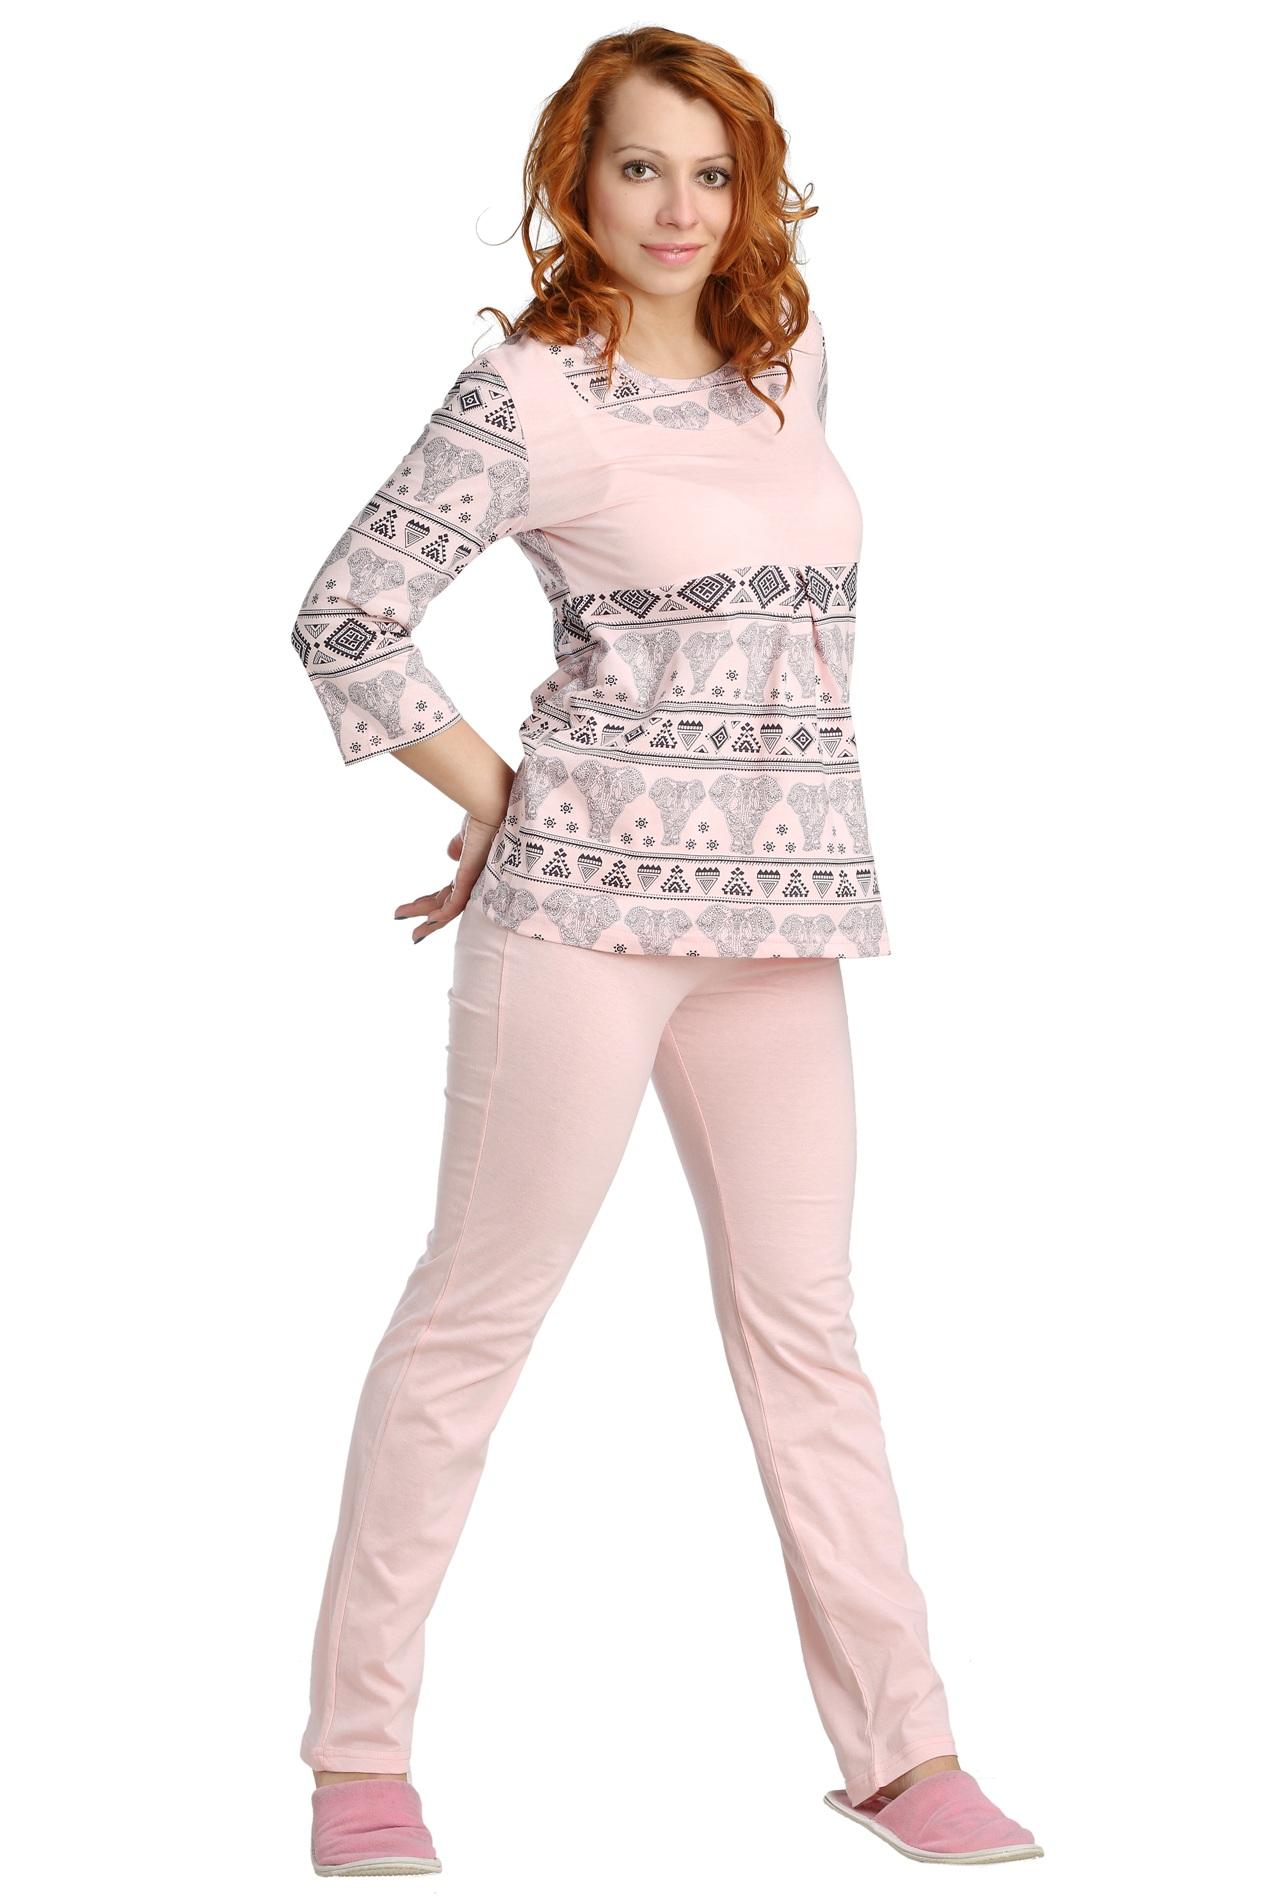 Жен. пижама арт. 16-0087 Розовый р. 52 ЕленаТекс